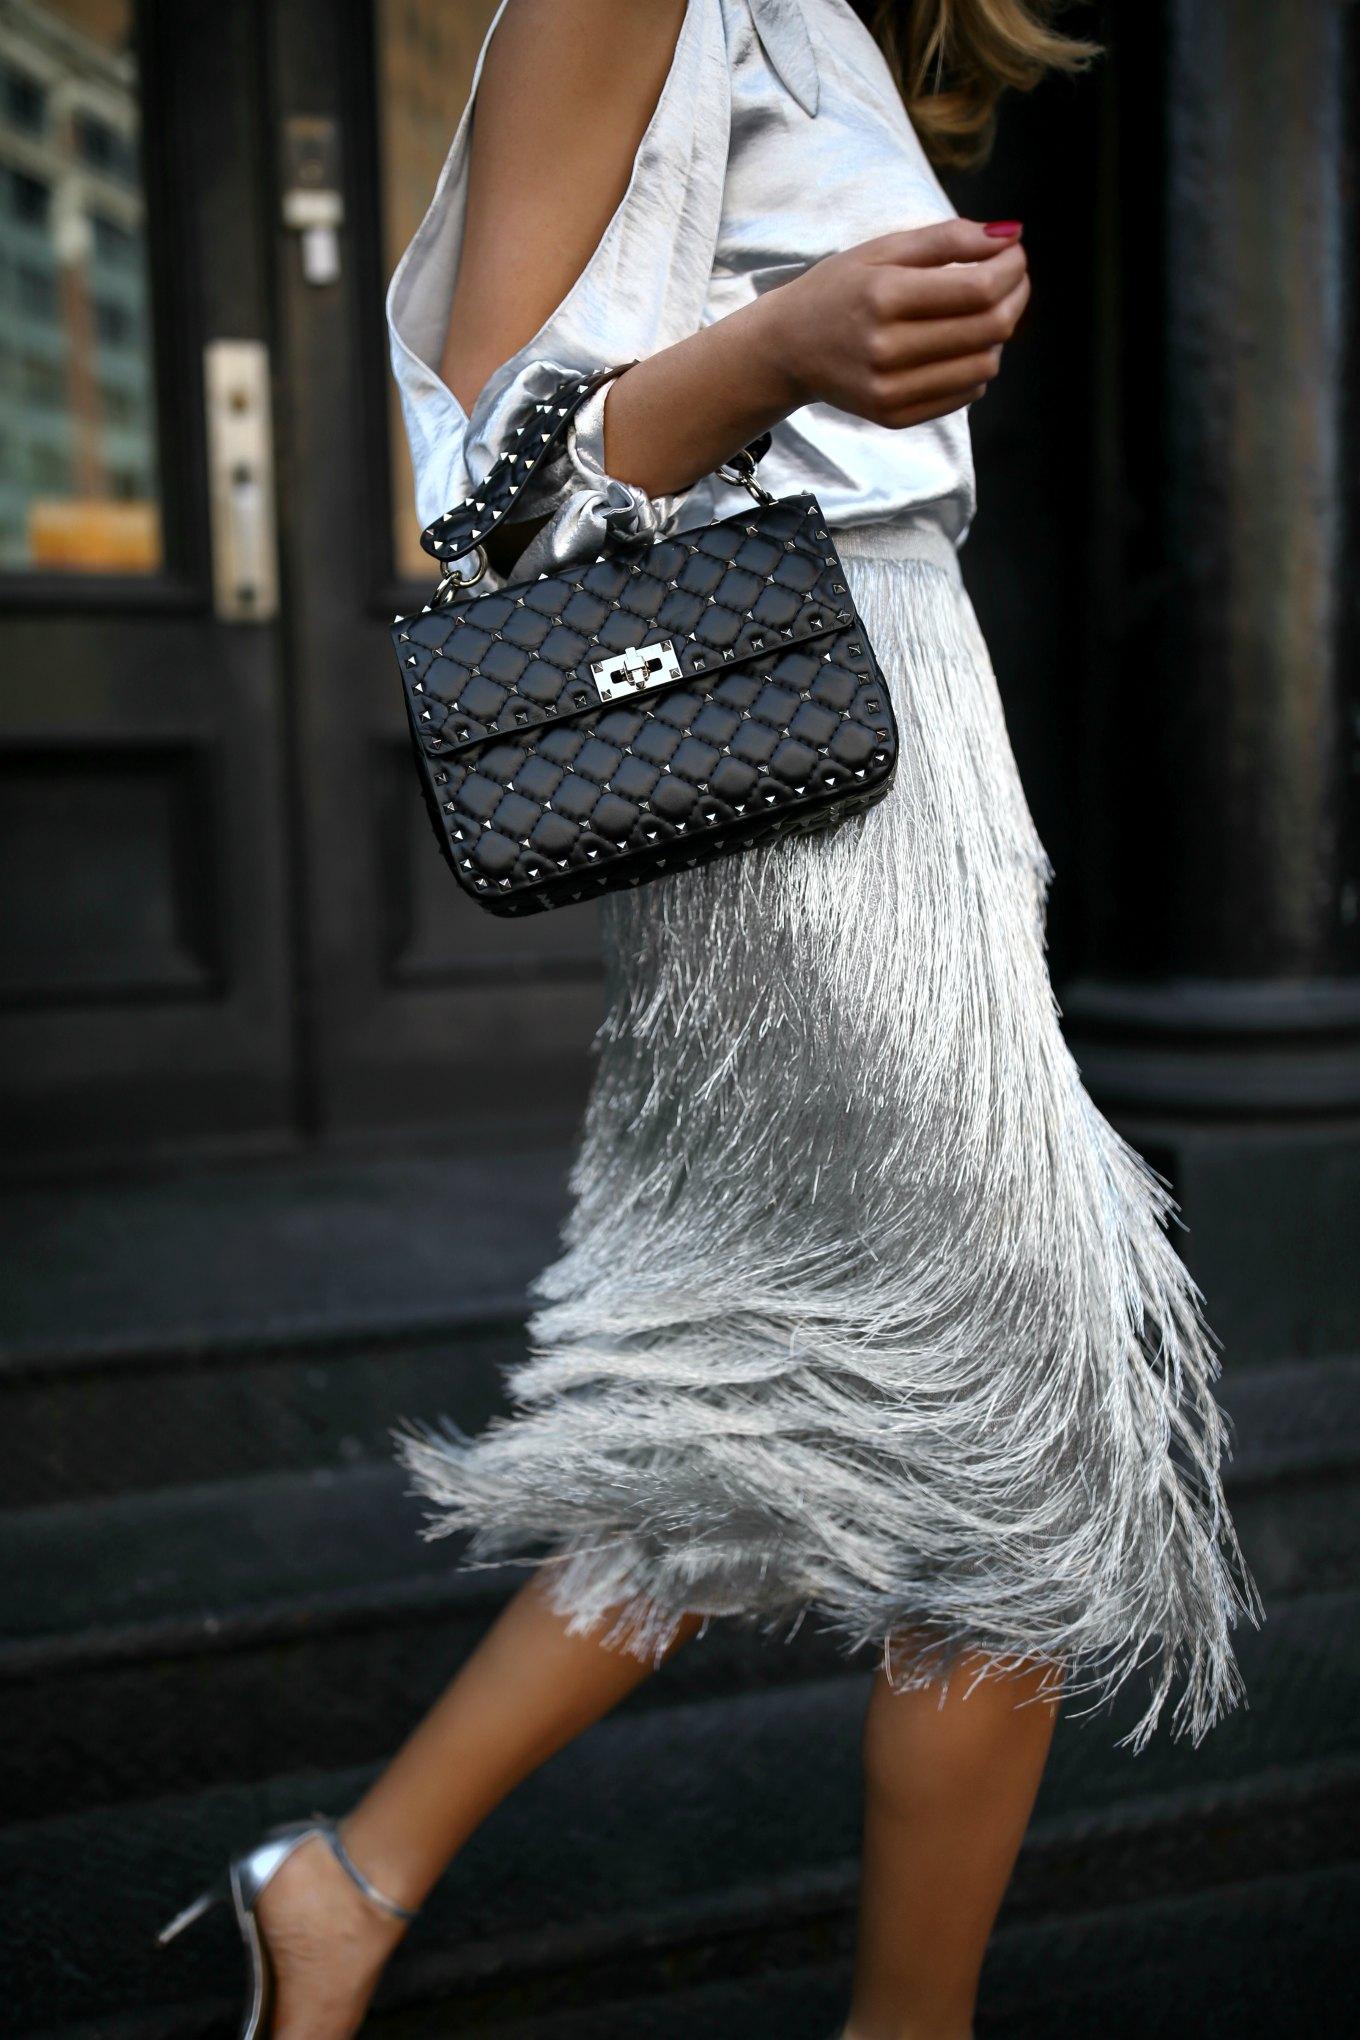 New York fashion blogger Mary Orton of Memorandum wears one shoulder metallic blouse by Rebecca Minkoff, Rachel Zoe metallic fringed silver midi skirt and Valentino studded leather shoulder bag